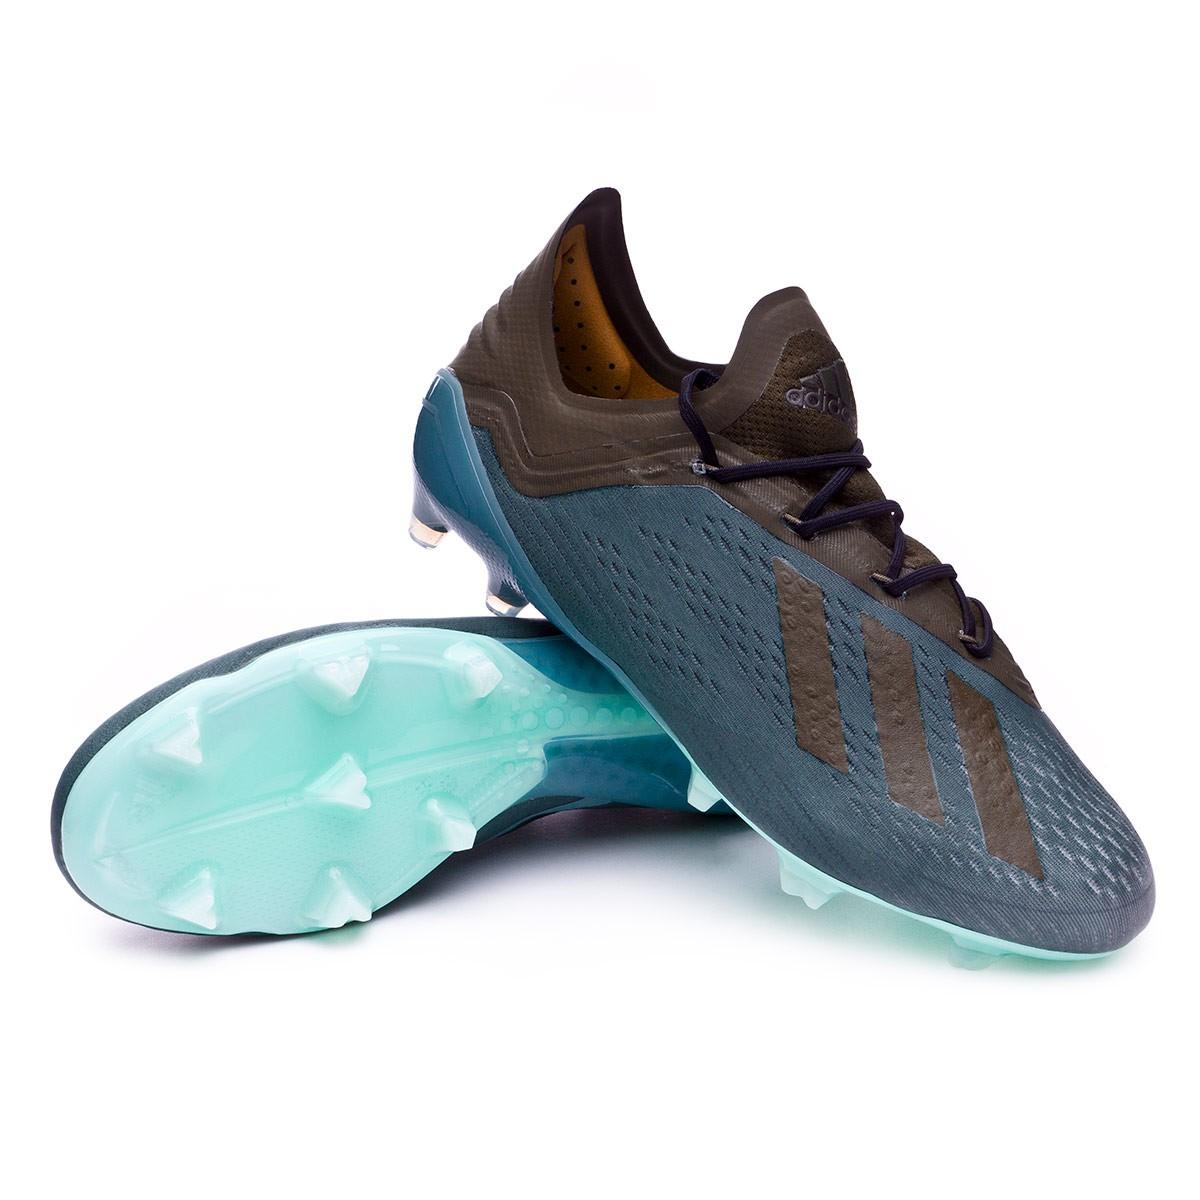 dae0eca7b08d Football Boots adidas X 18.1 FG Raw green-Night cago-Clear mint ...